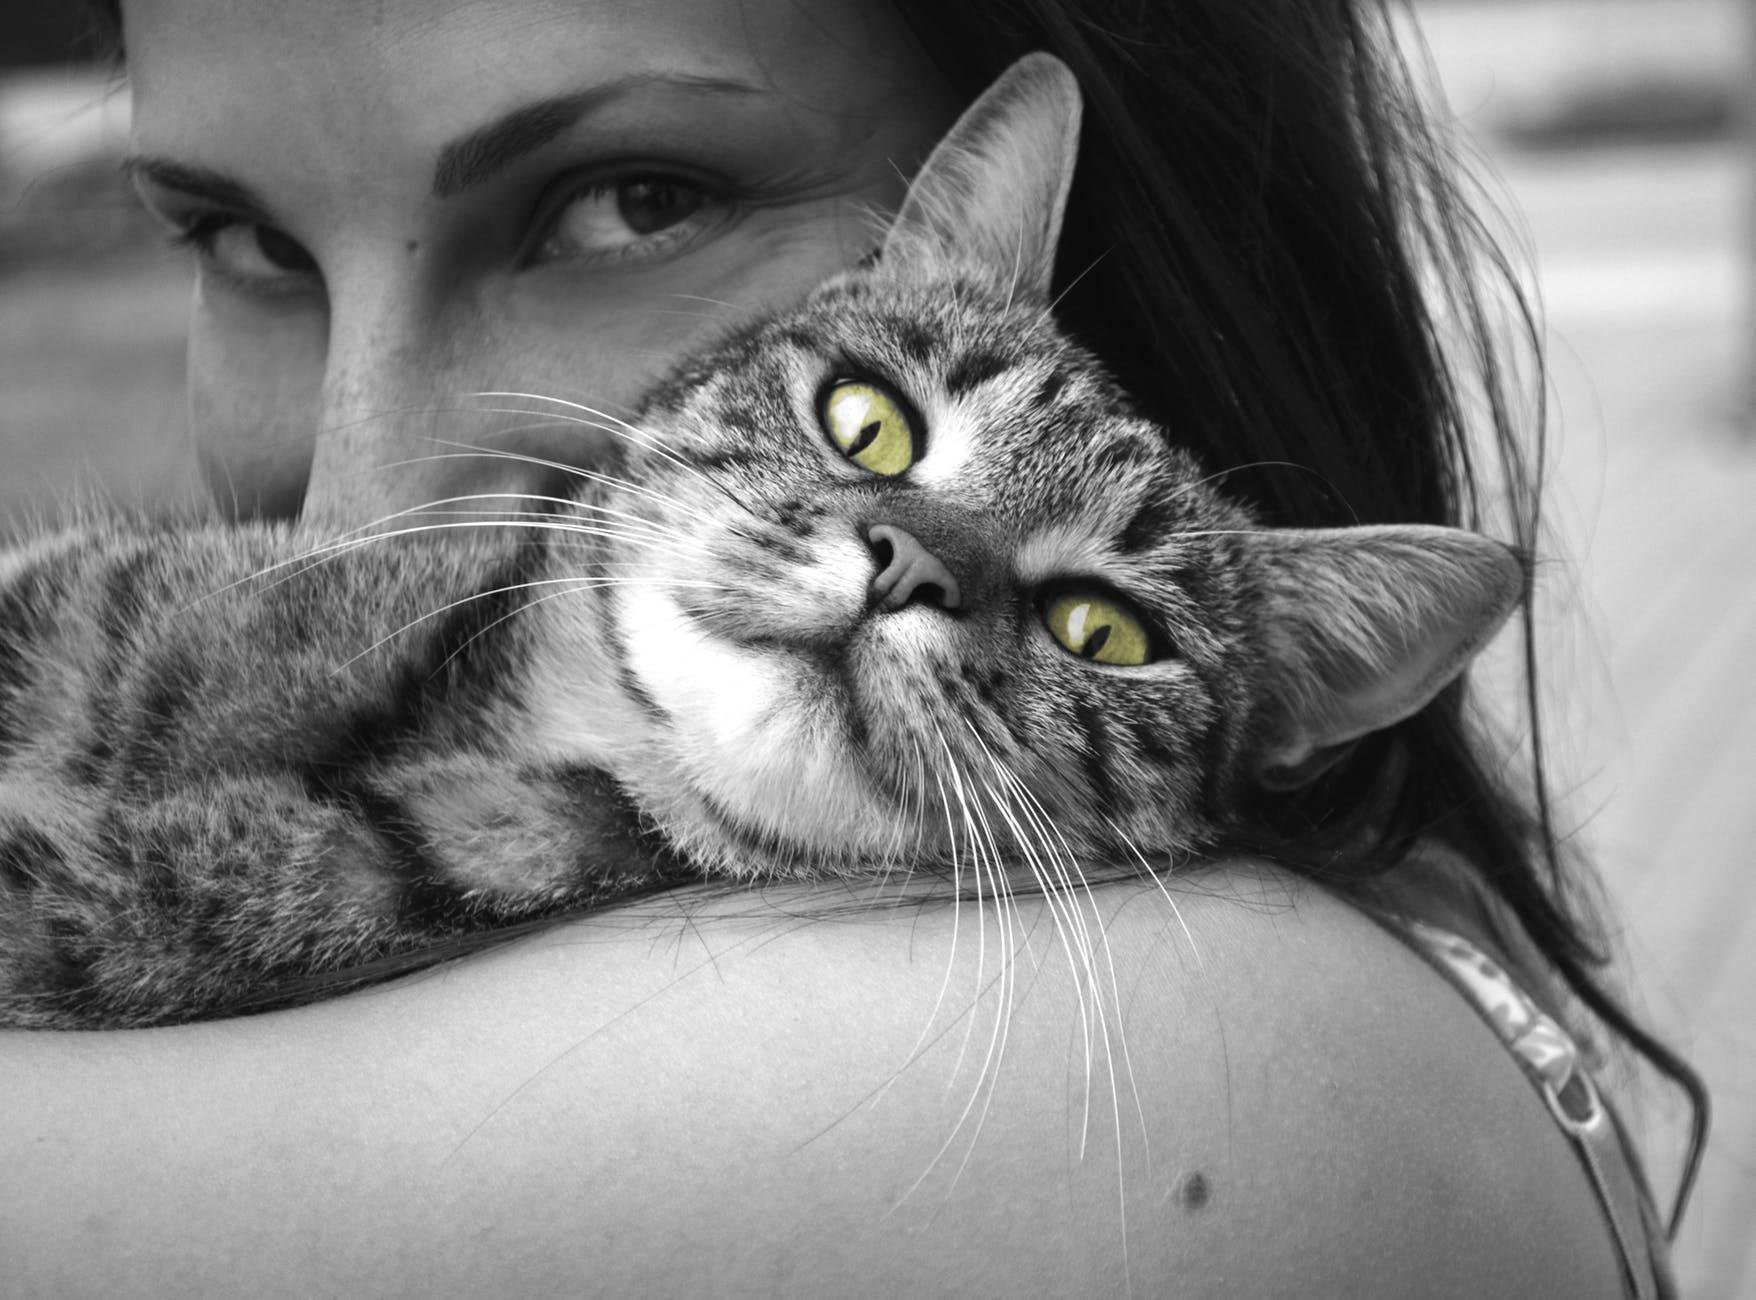 animals-cat-girl-happiness-39493-8430111